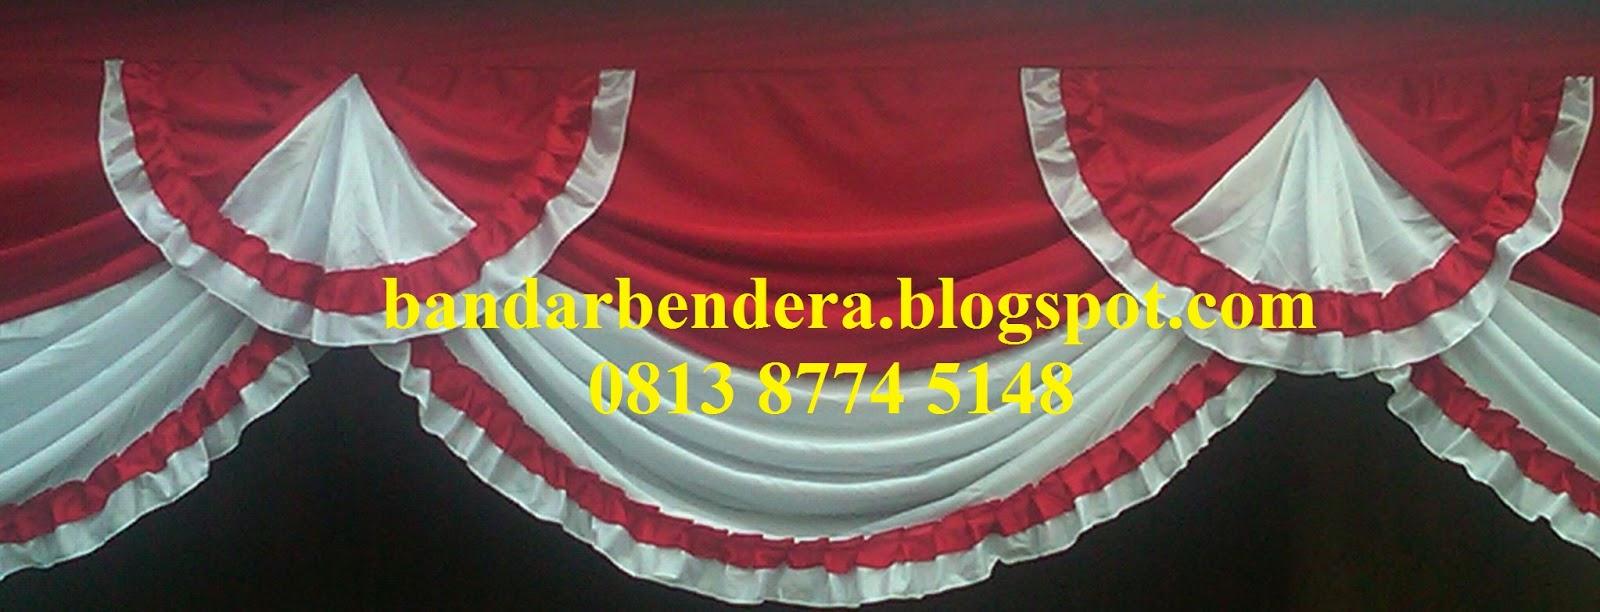 Bandar Bendera Merah Putih Plastik Flag Palstik